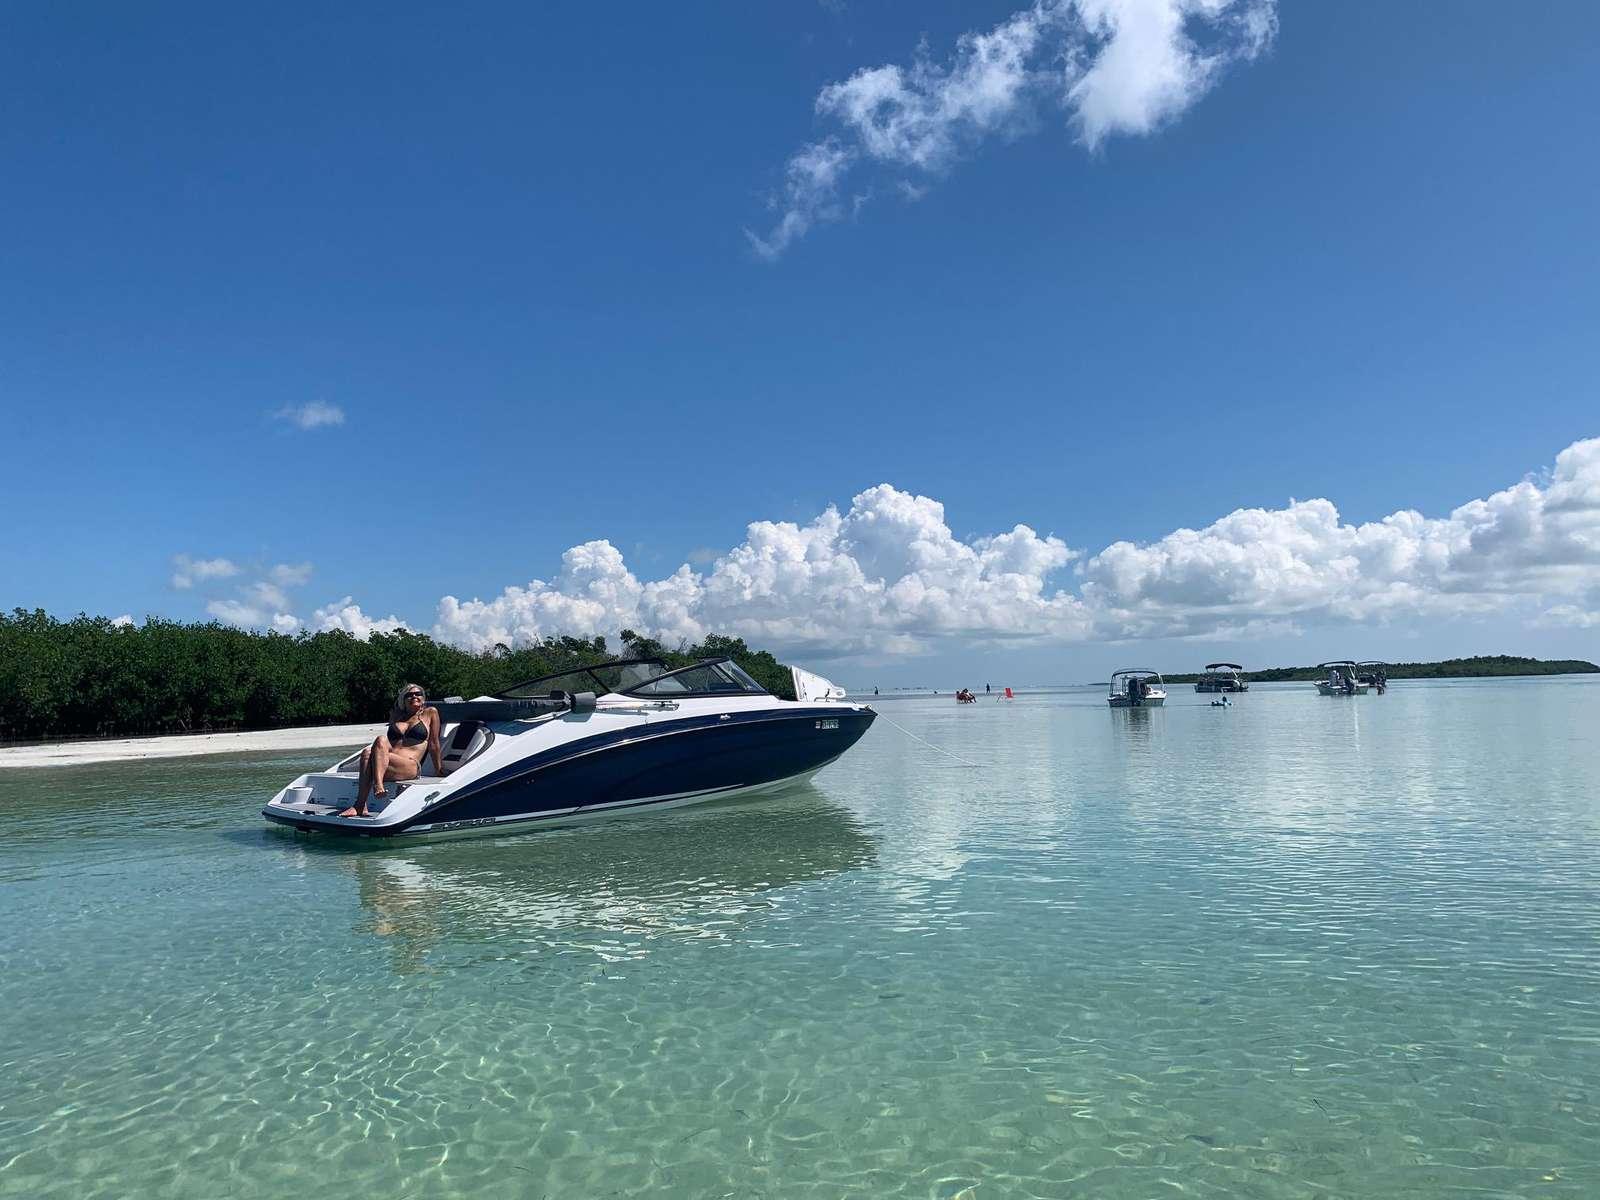 2020 SZ2100 Yamaha Jet Boat - property